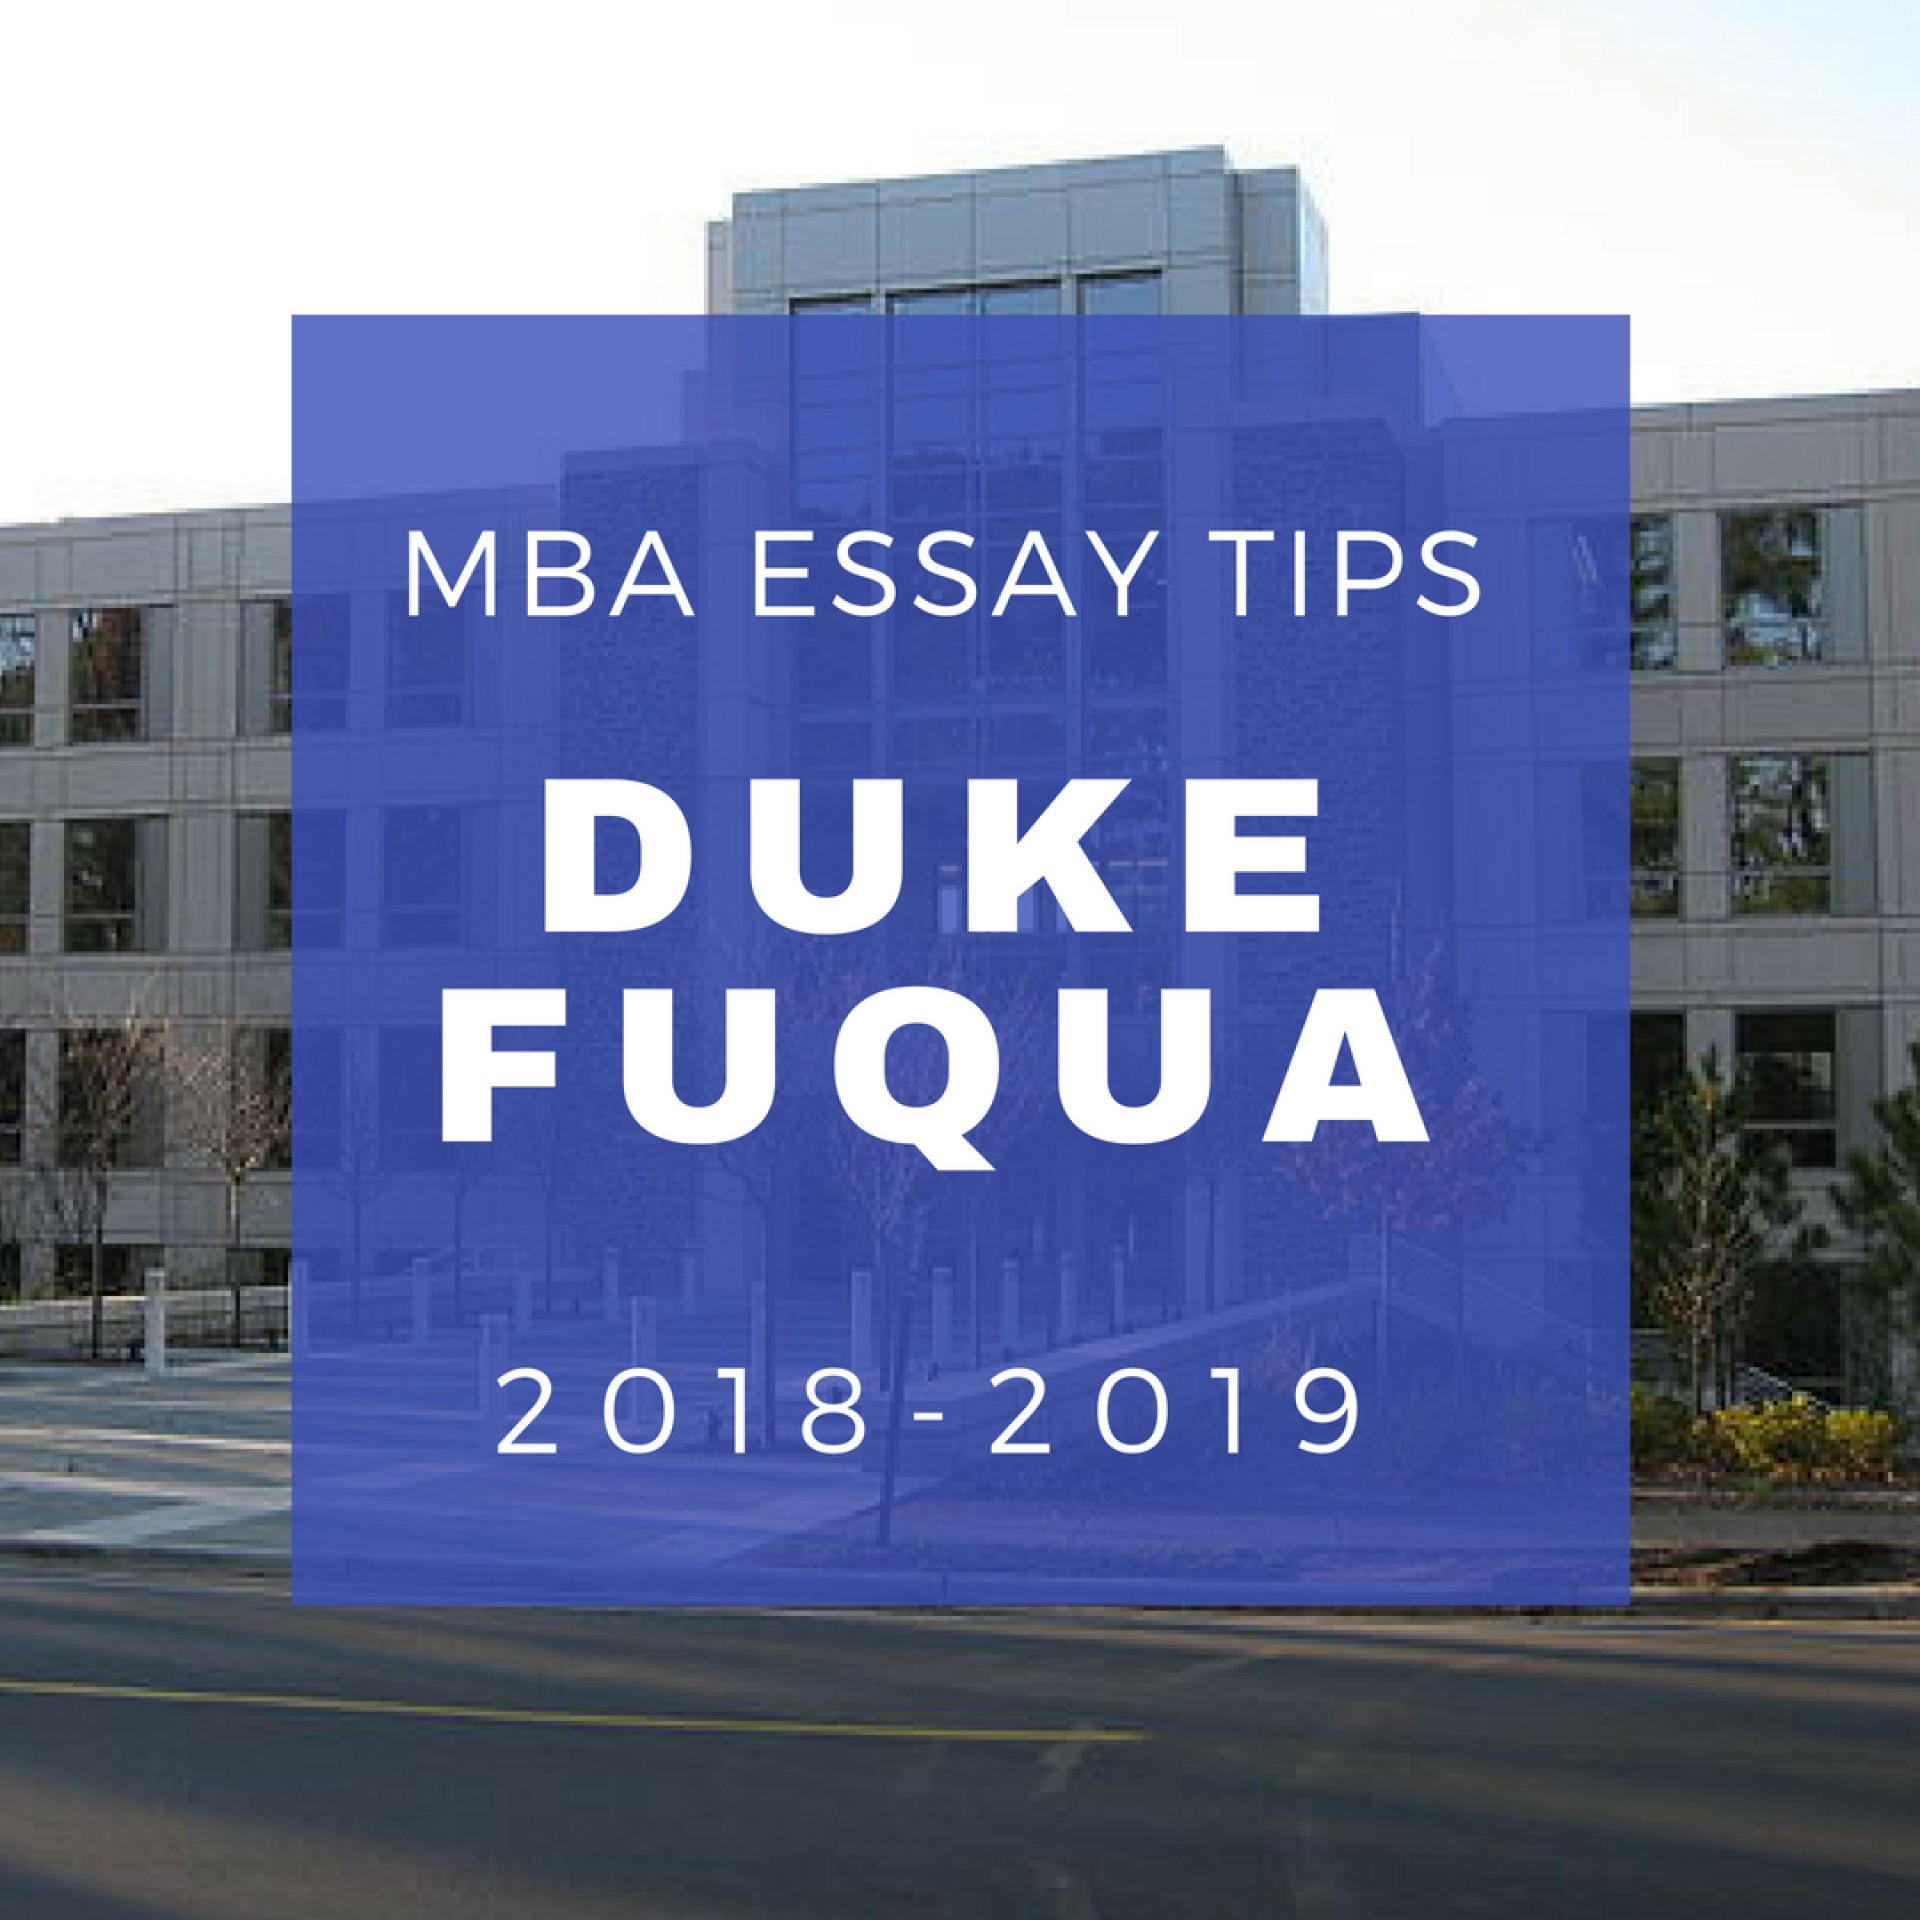 002 Essay Example Duke Mba Essays Fuqua Archaicawful Analysis Examples 1920